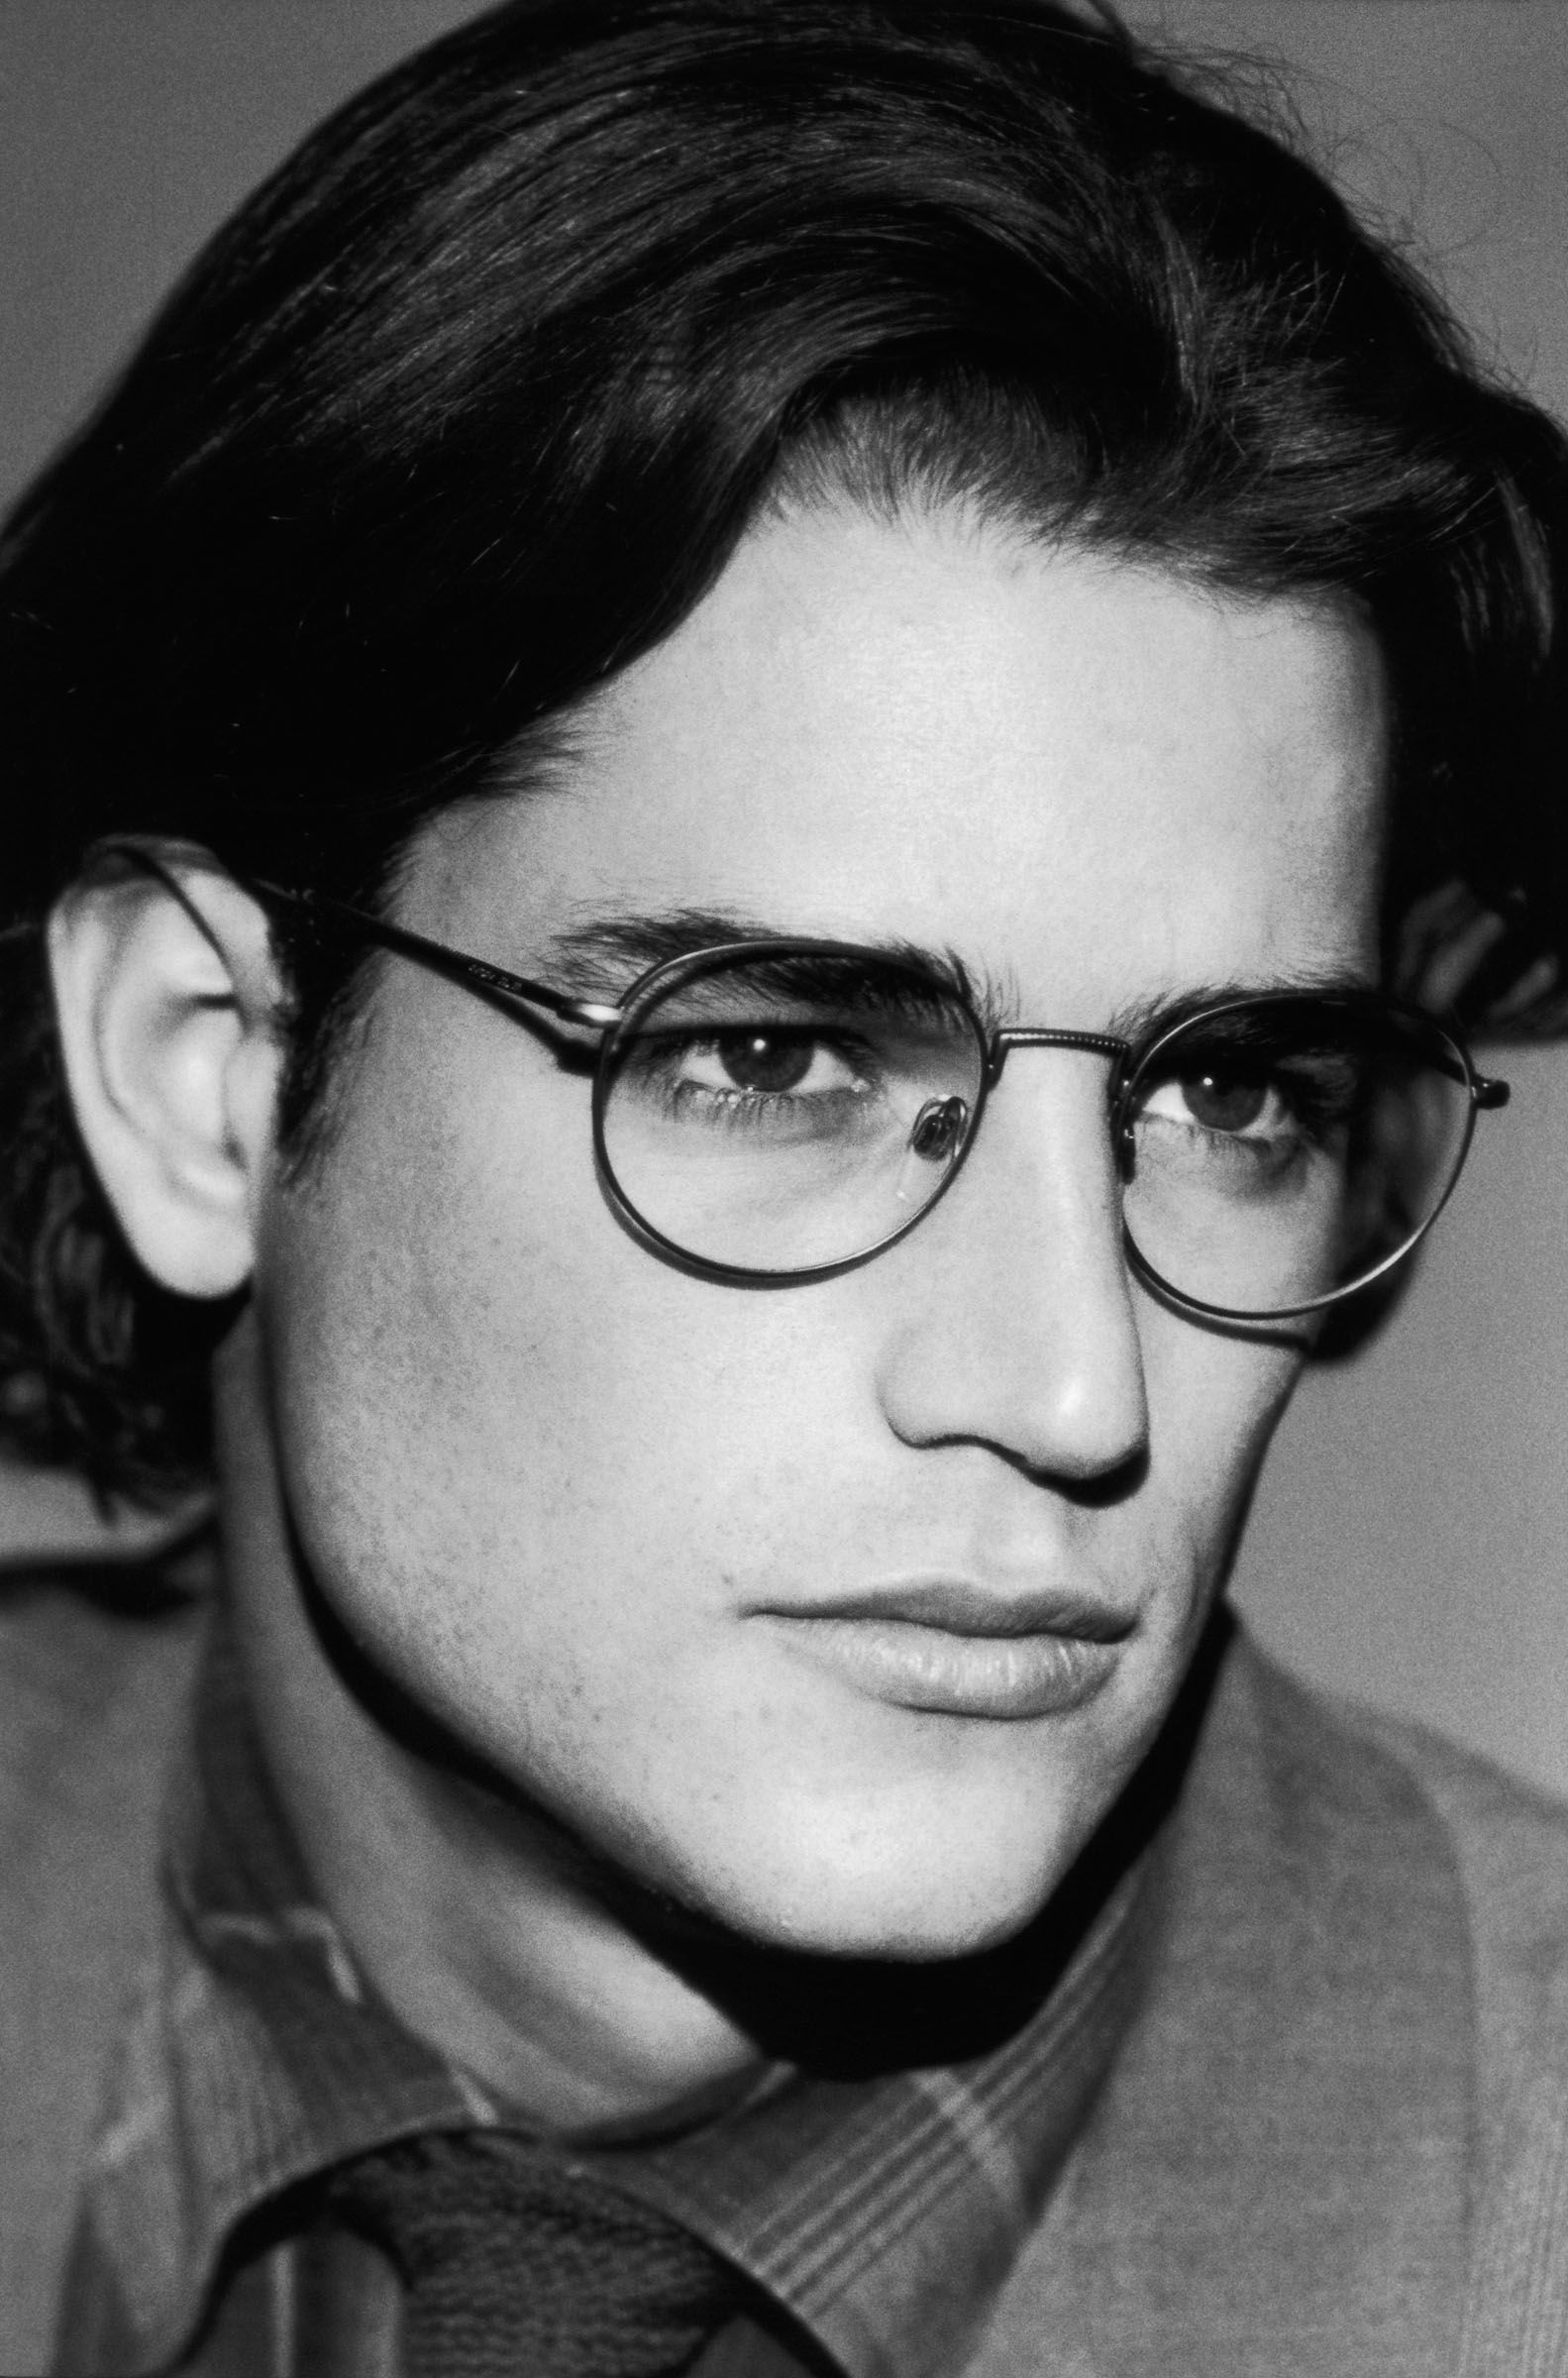 Atribute to Frames  The Giorgio Armani 1995 eyewear campaign shot by Peter  Lindbergh. 07b5fc2c1a